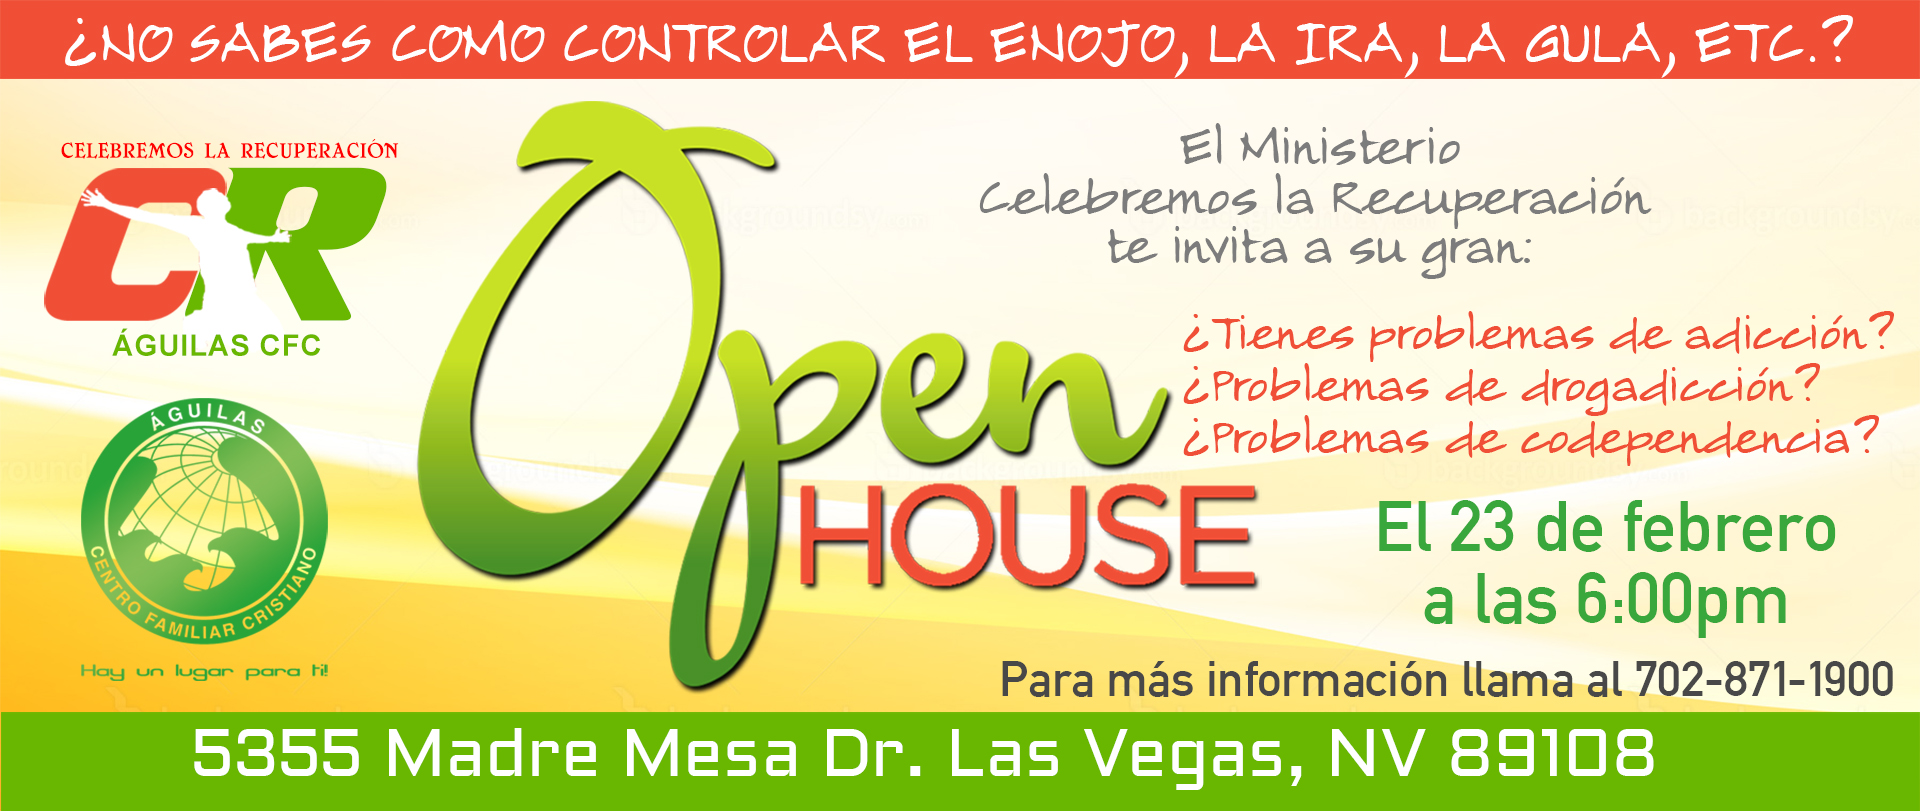 OPEN HOUSE Celebrando la Recuperación